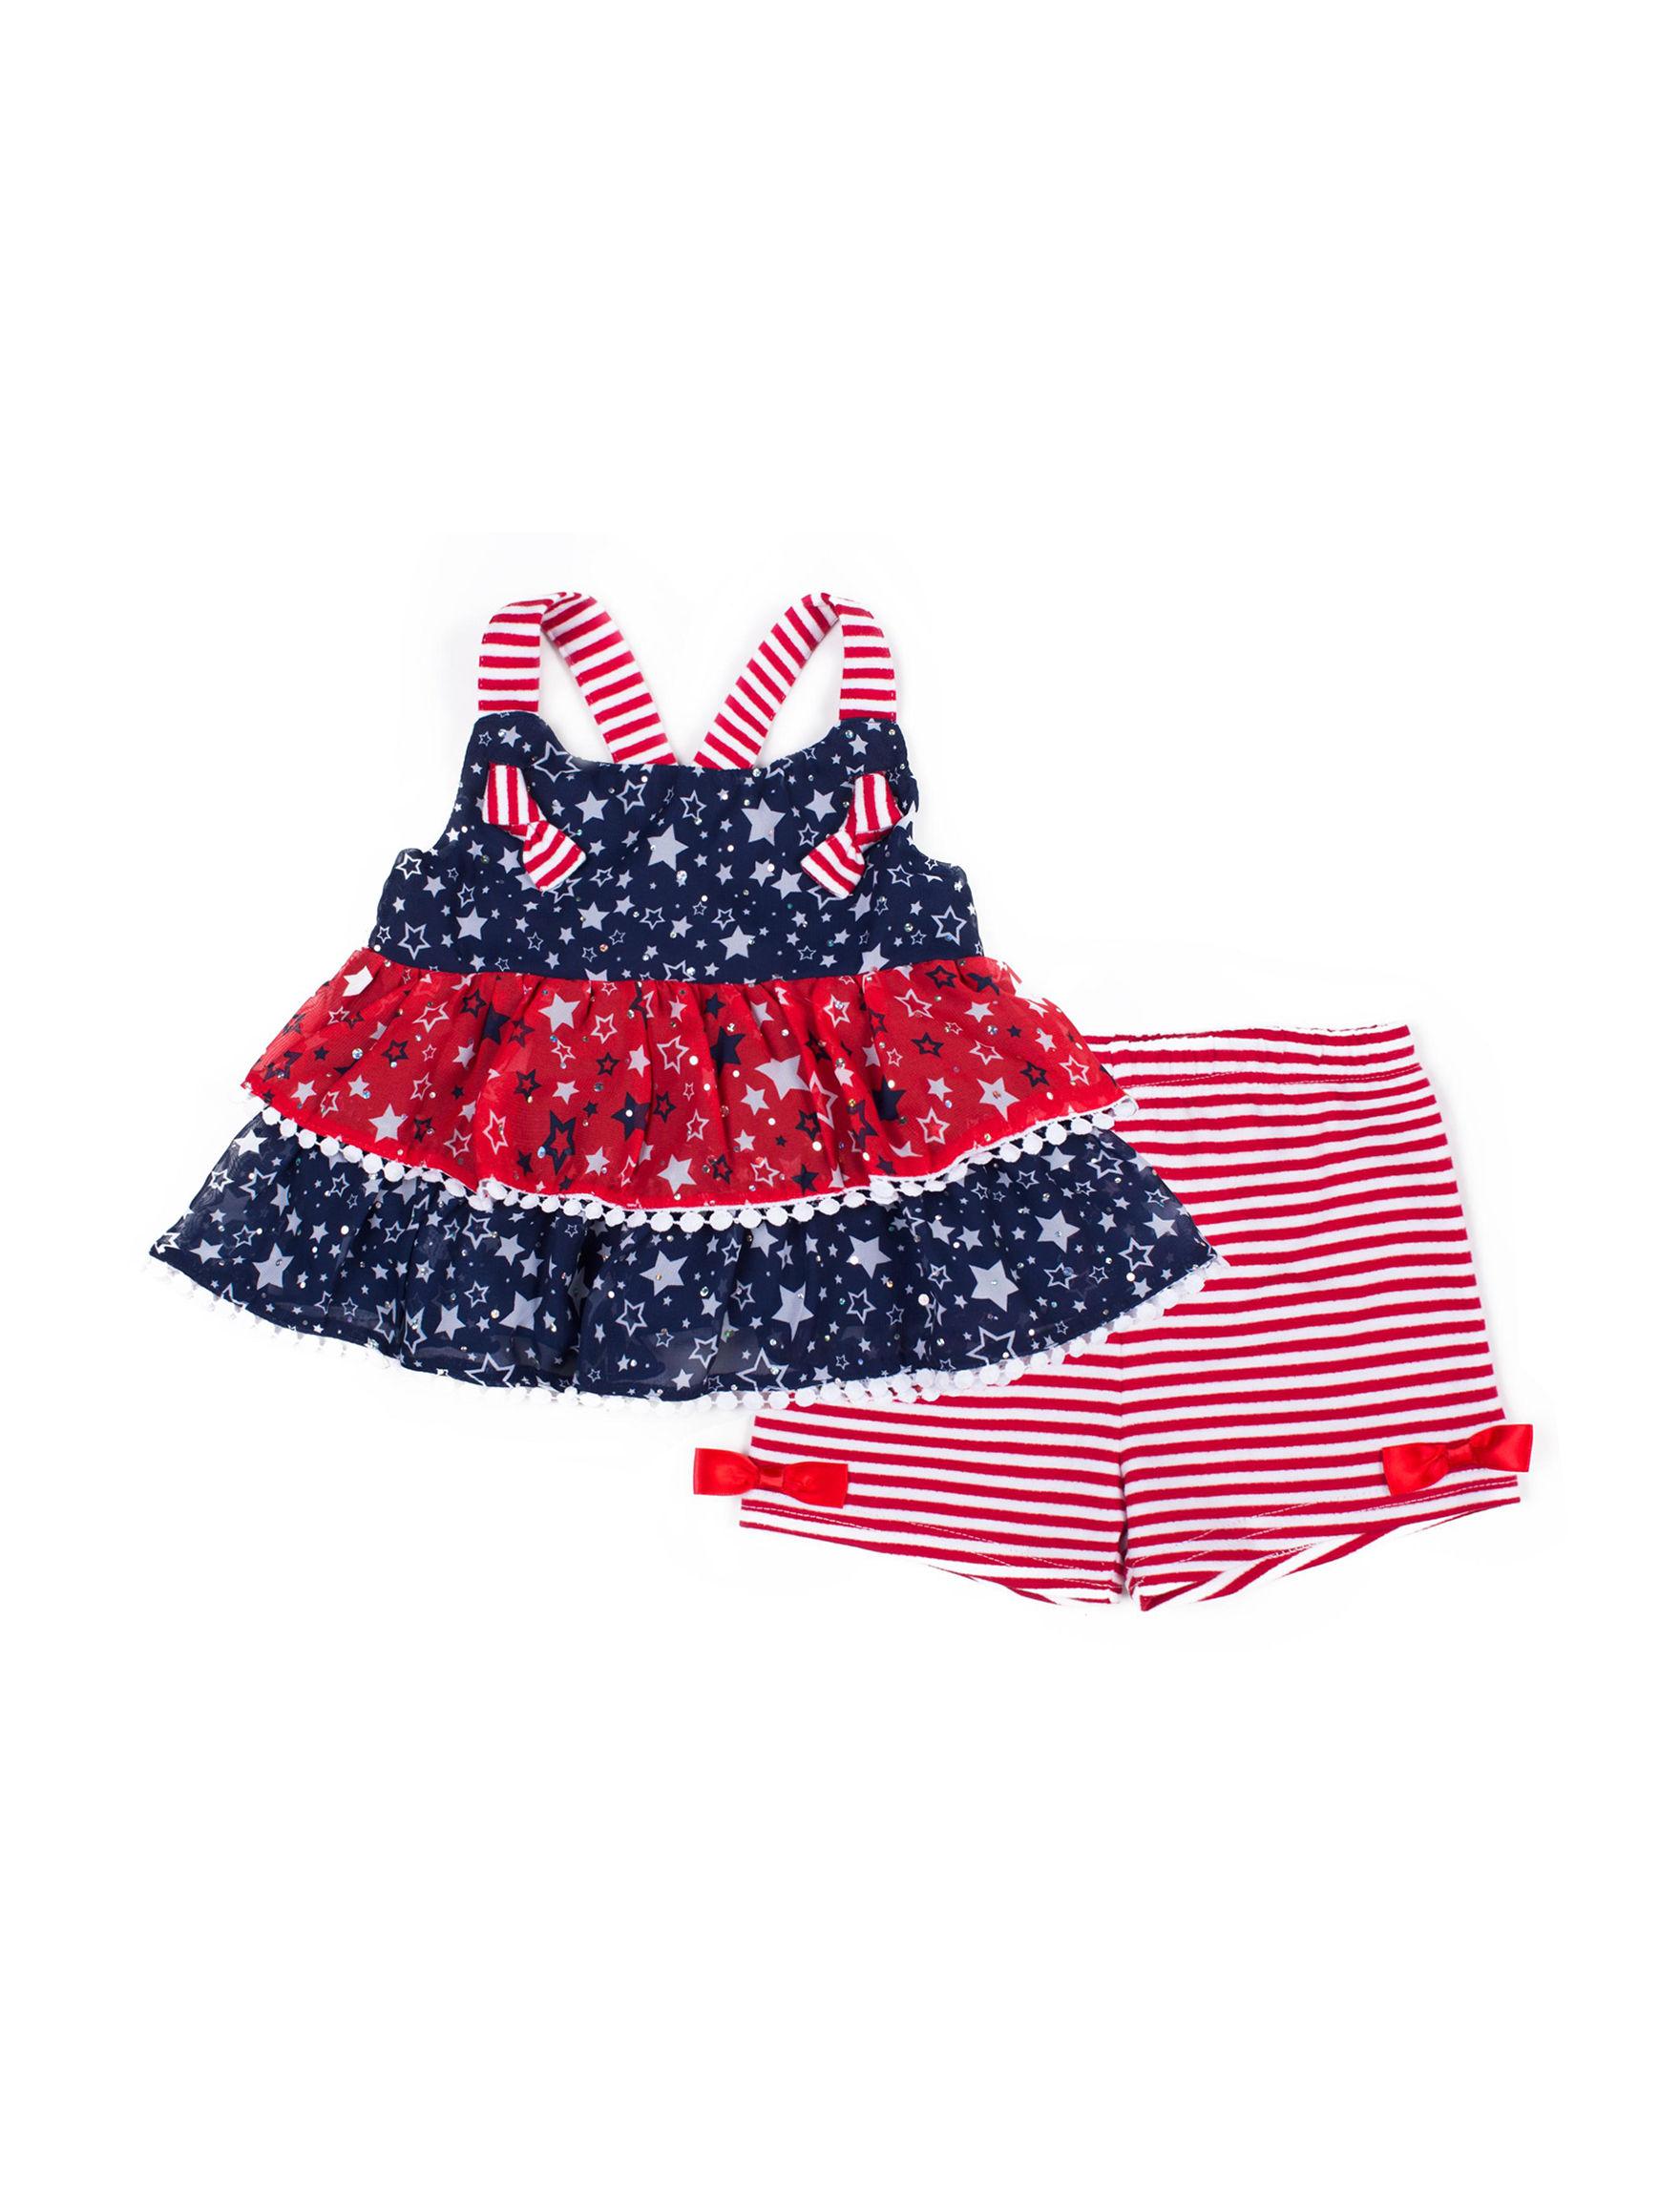 Little Lass Navy / Red / White